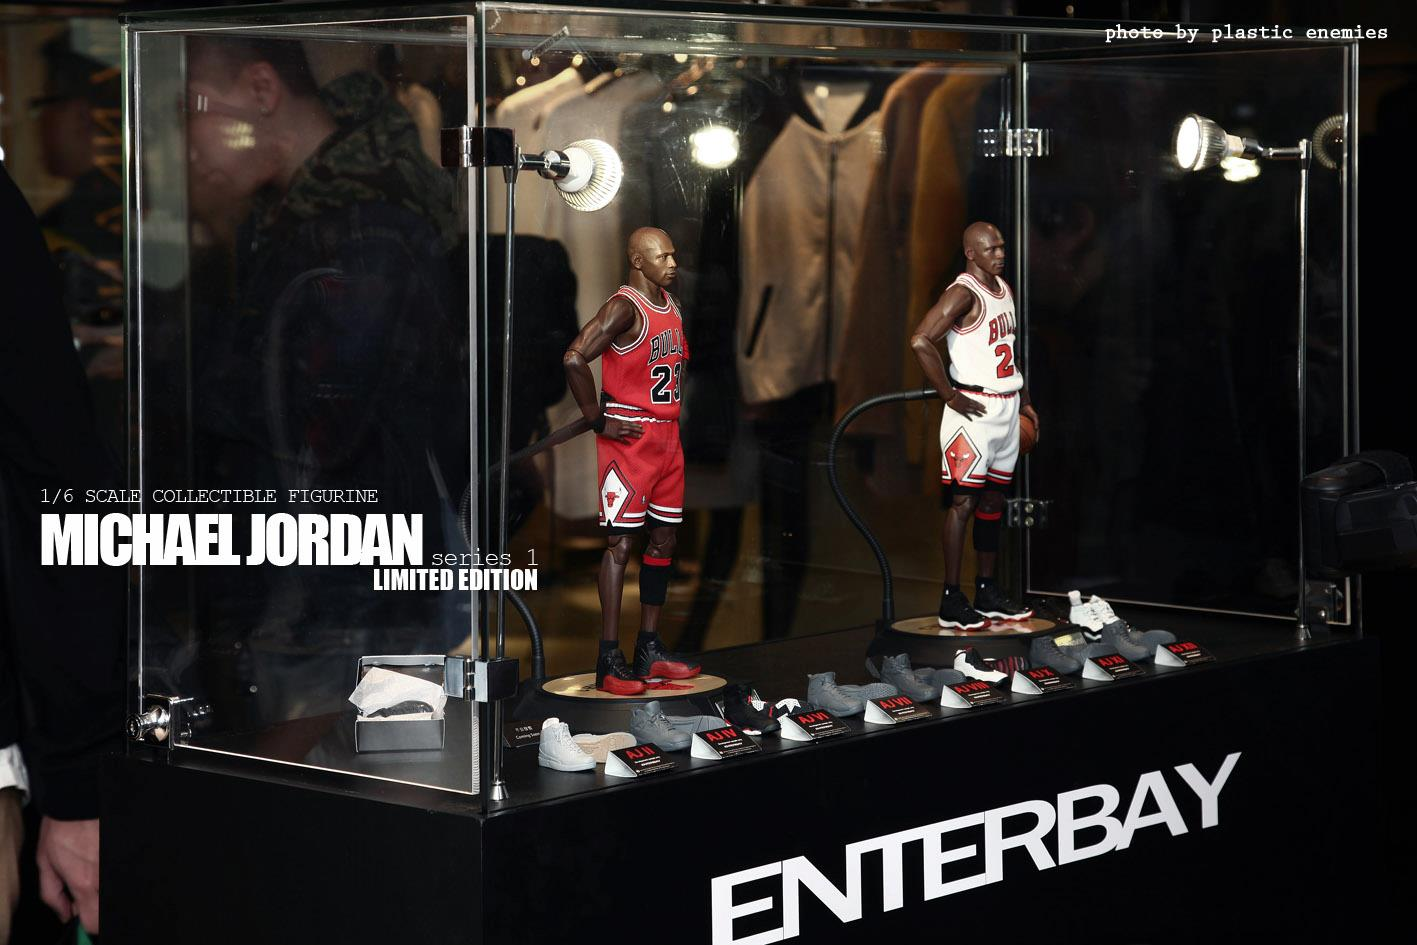 [ENTERBAY] NBA Real Masterpiece - Michael Jordan | Series 1 - Página 10 Mjs